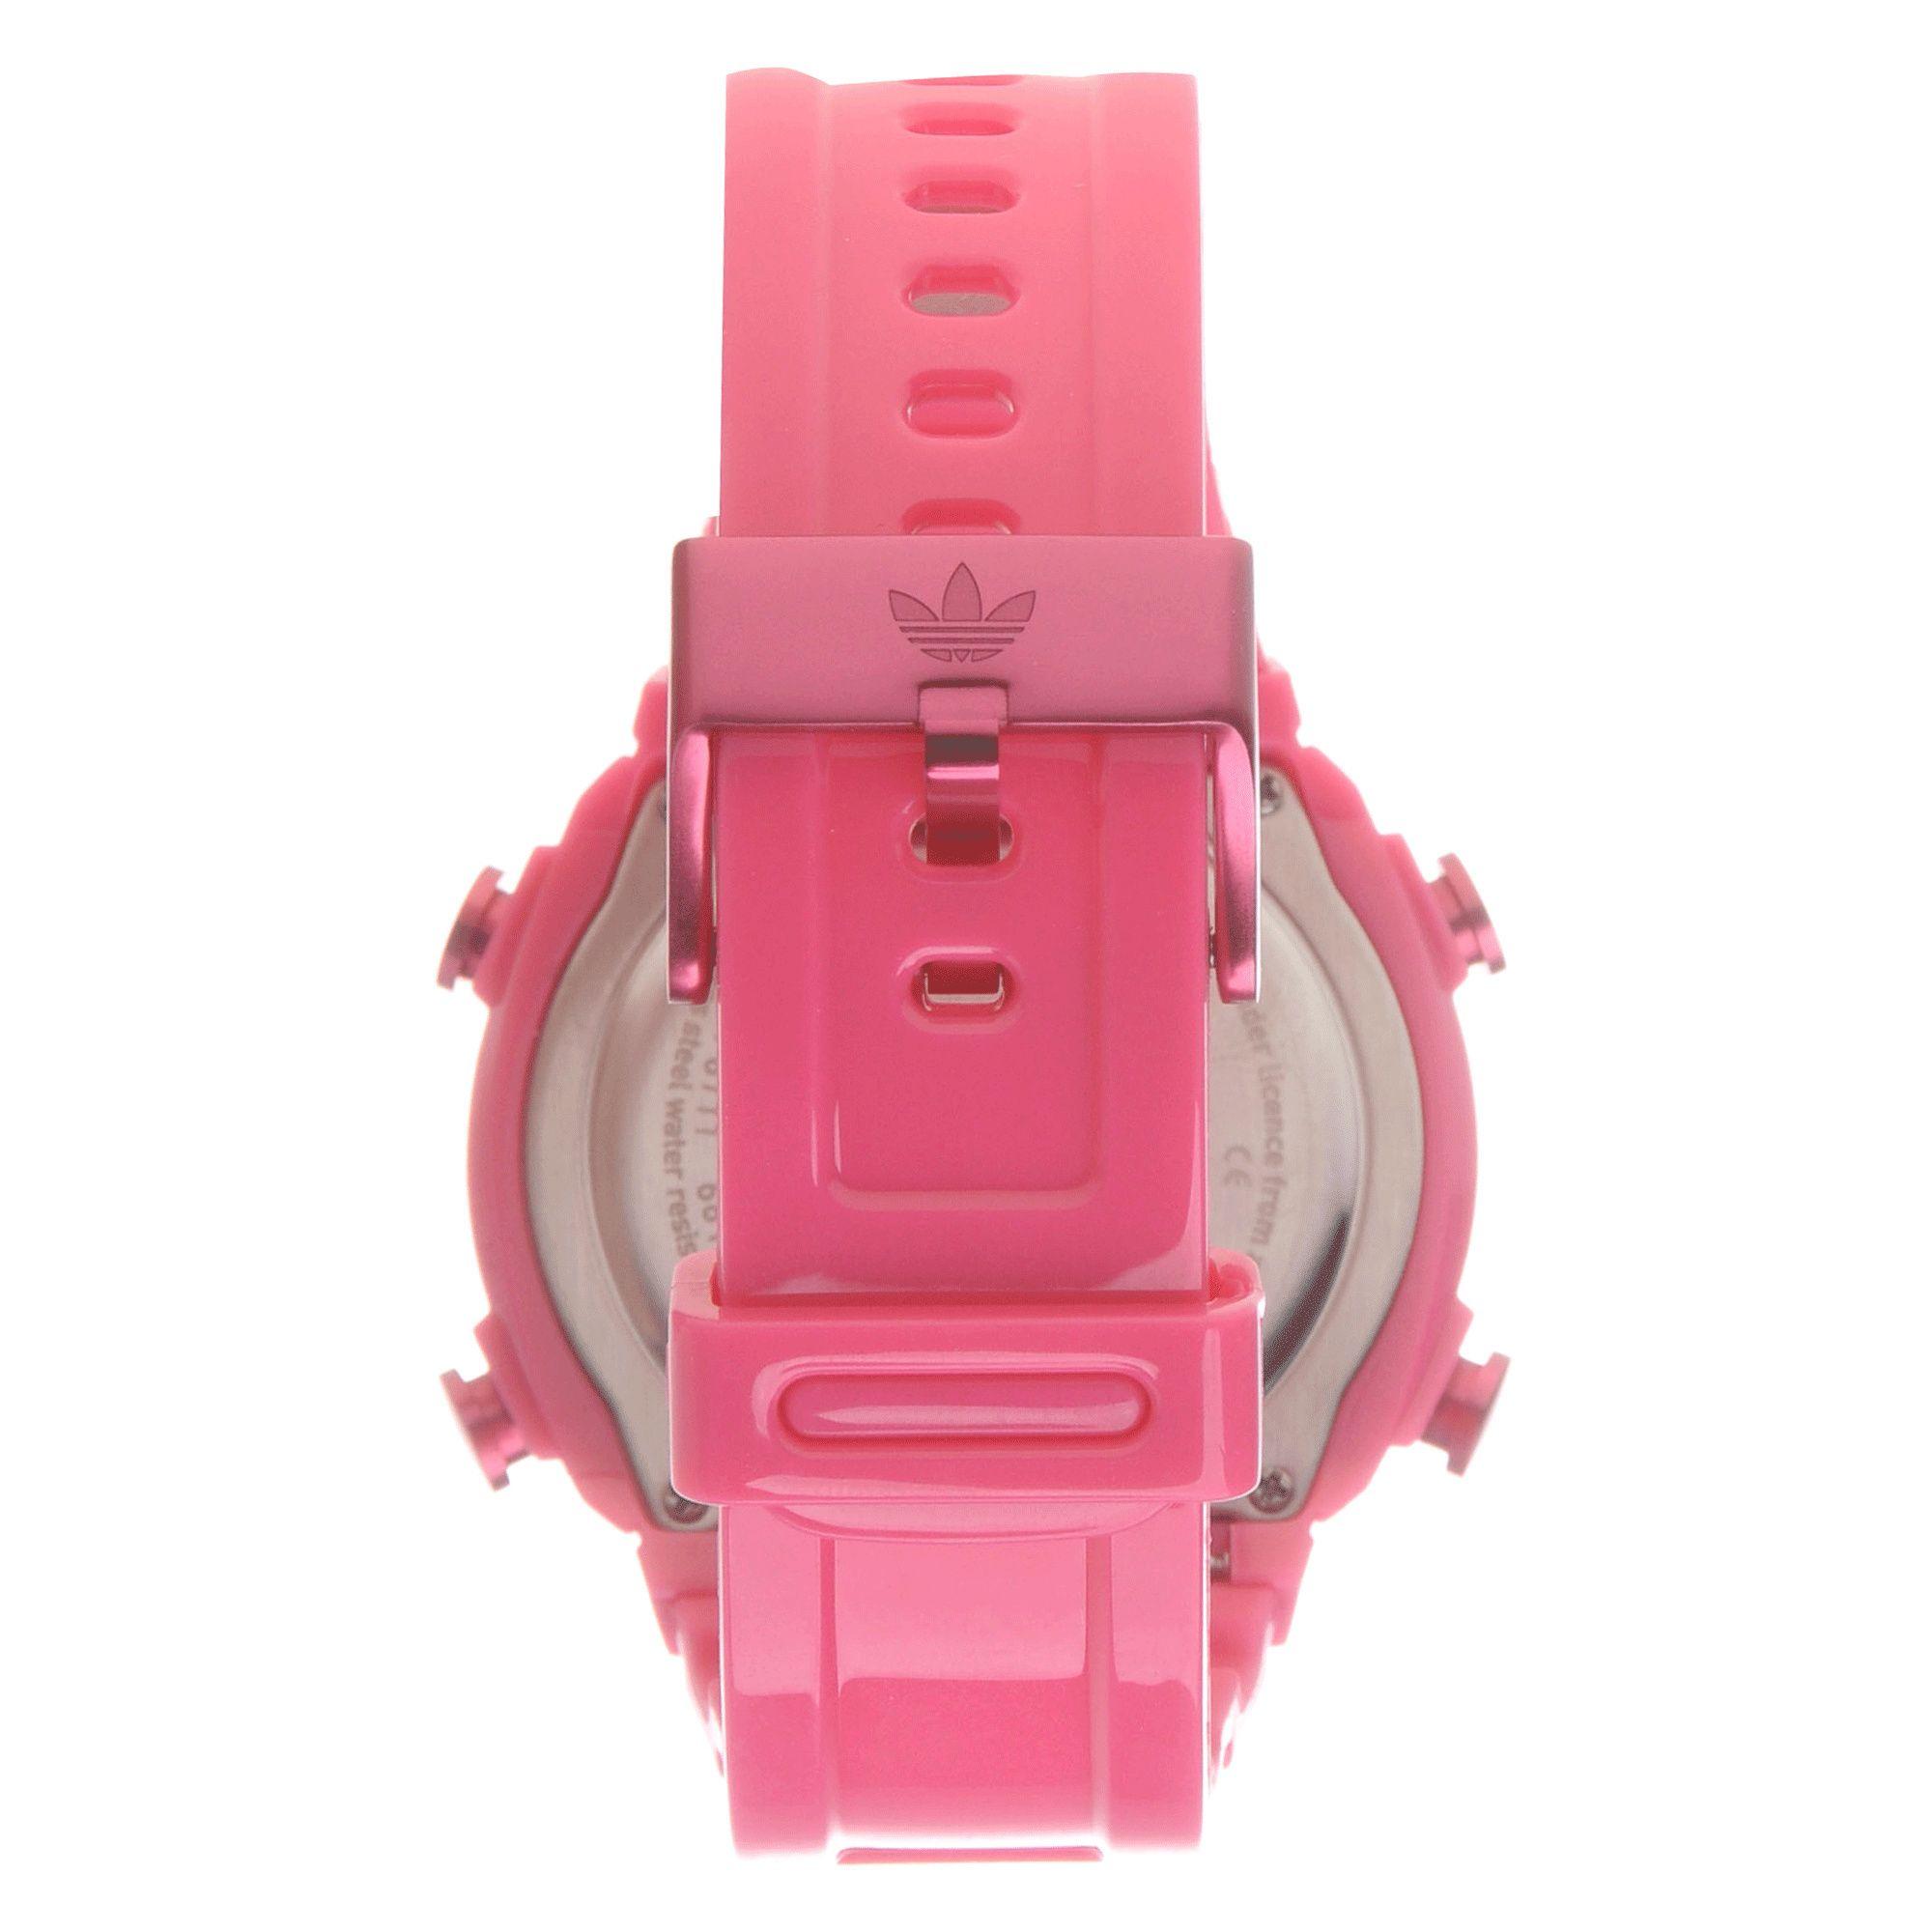 adidas Originals Candy Watch